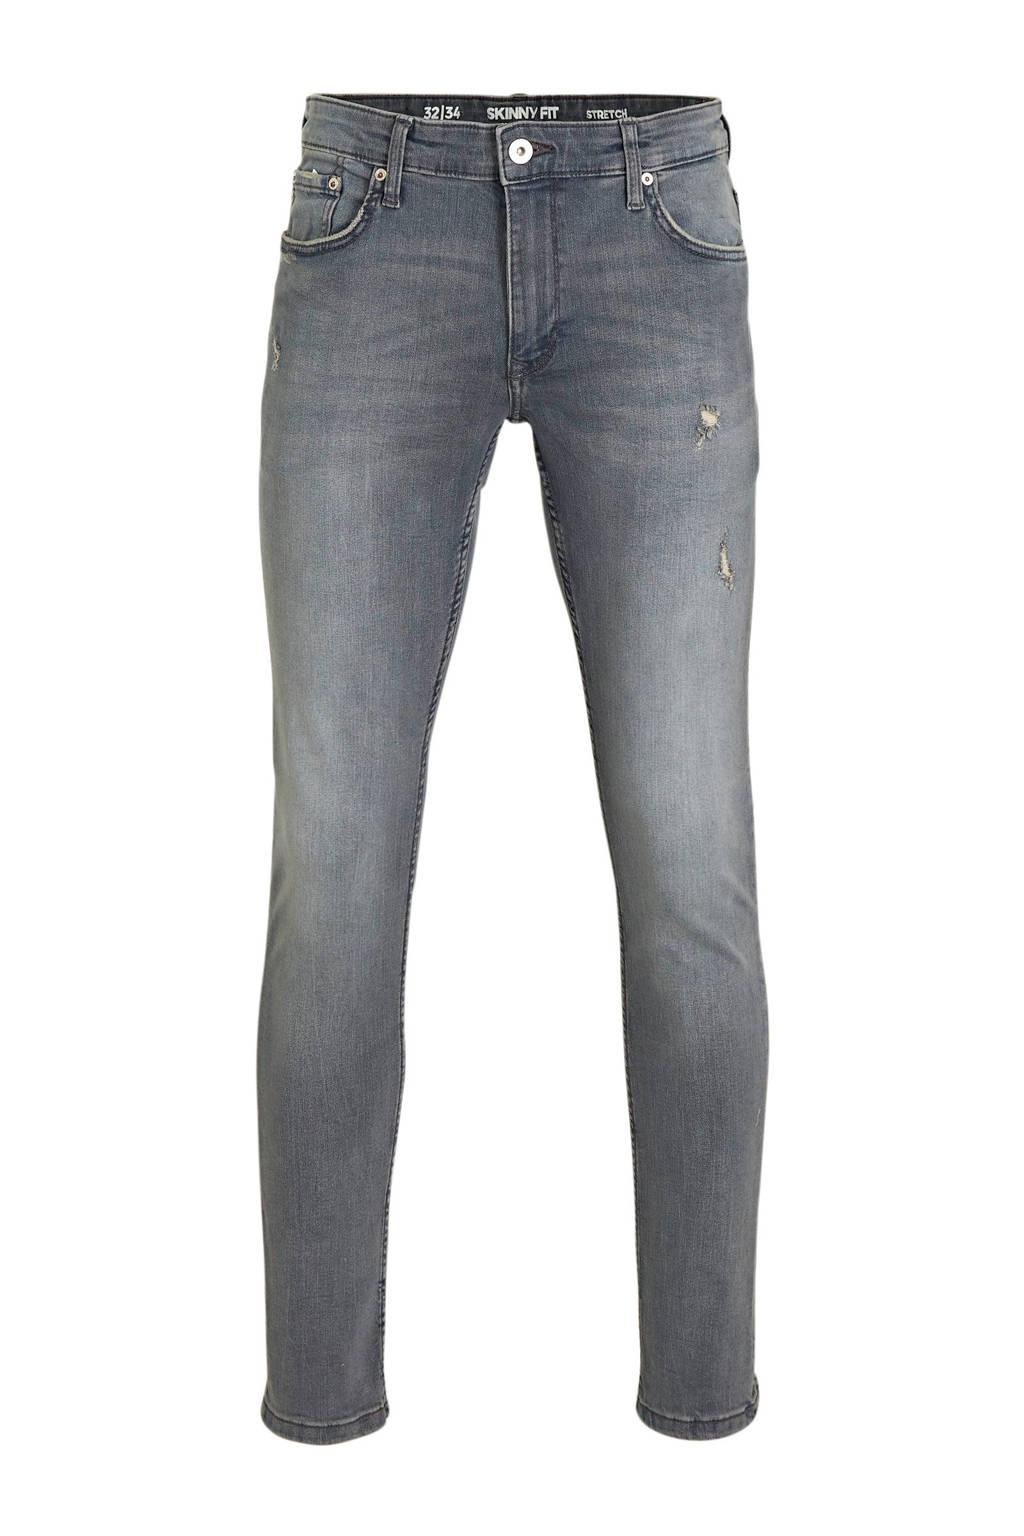 C&A Clockhouse skinny jeans grijsblauw, Grijsblauw